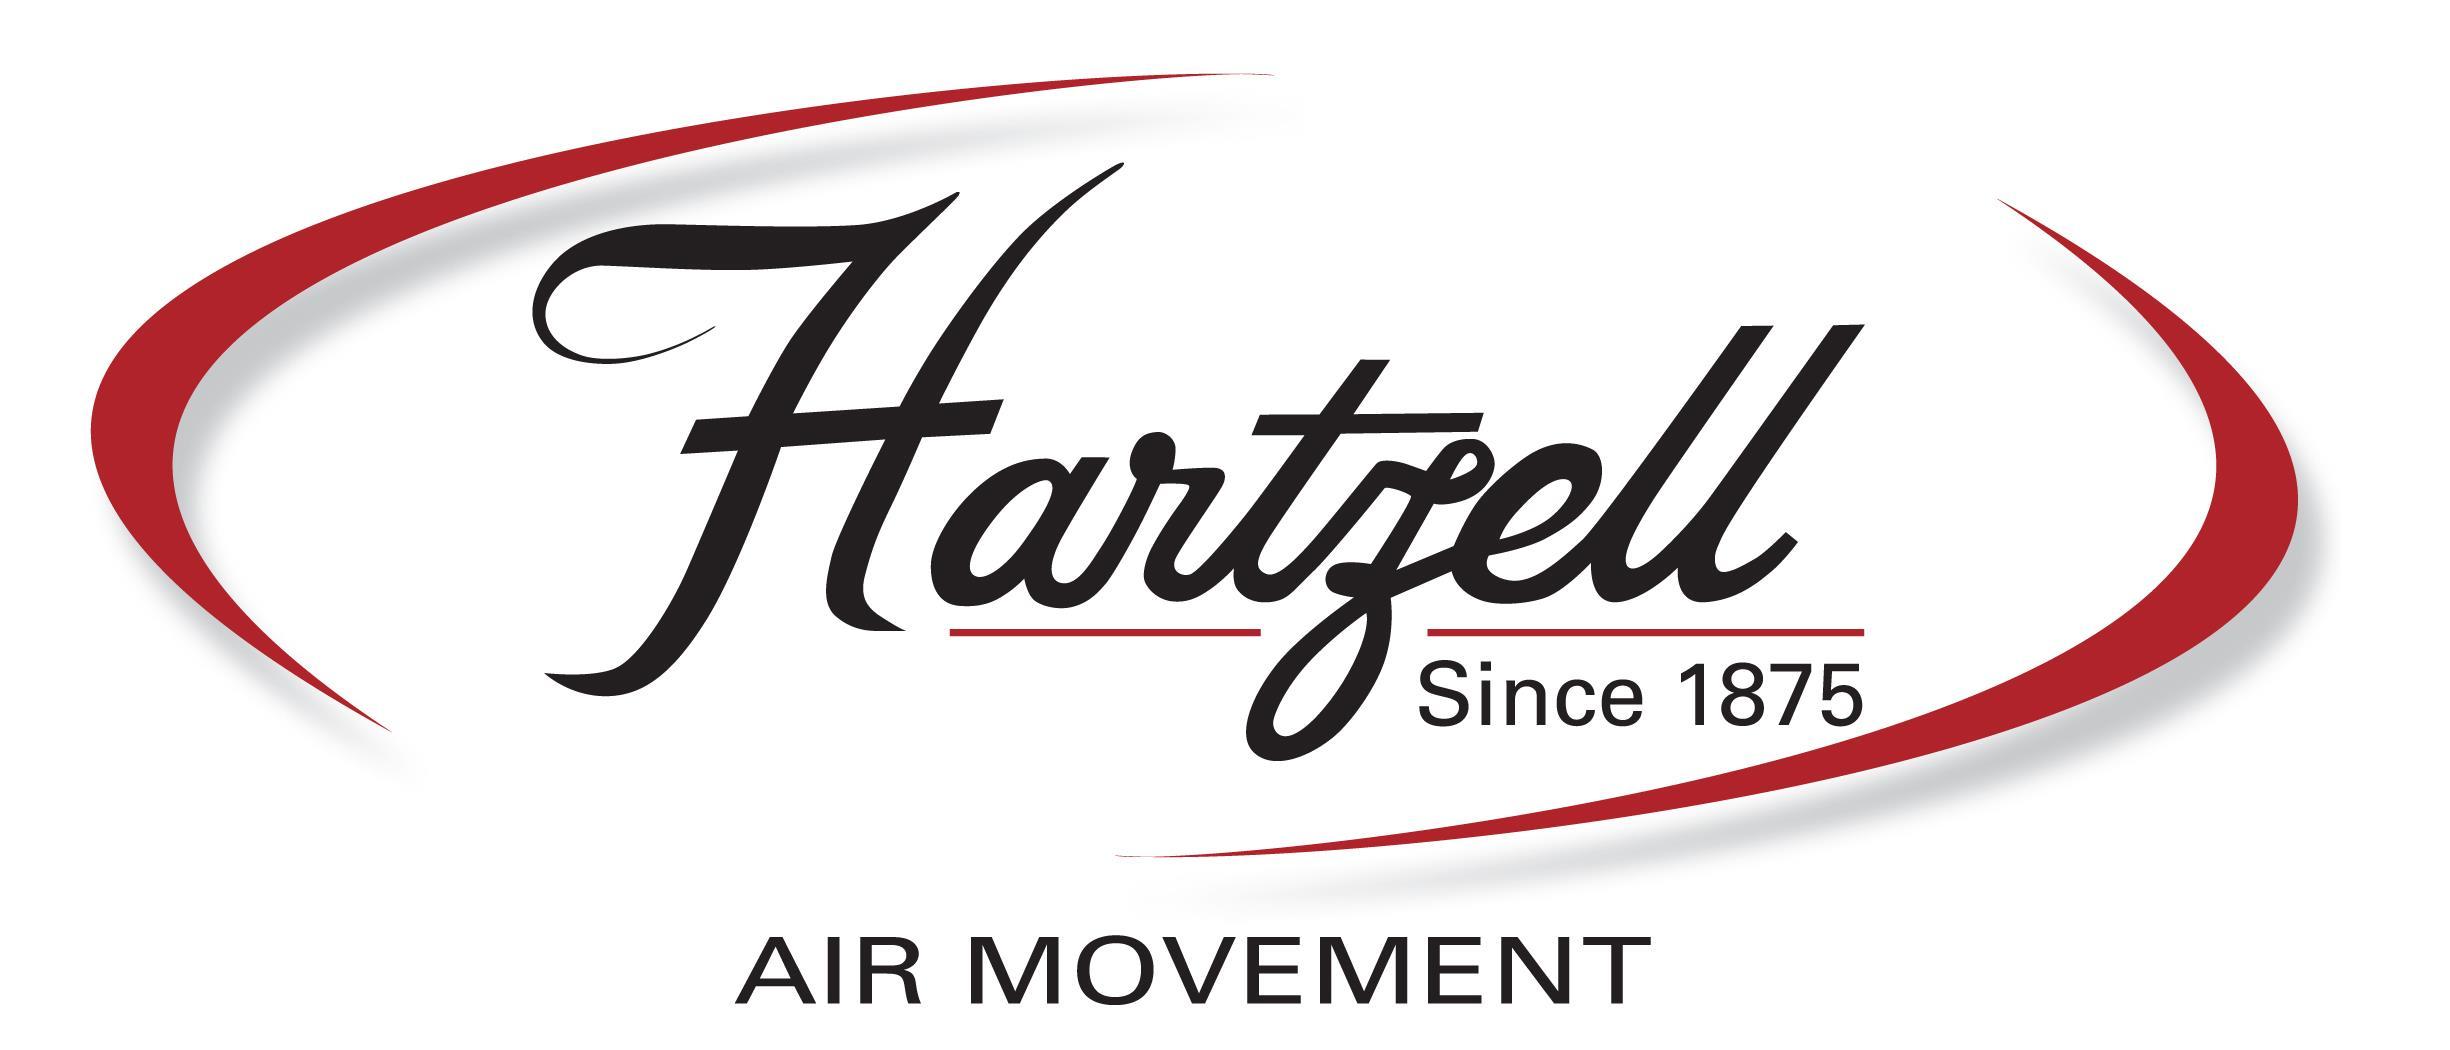 Hartzell Air